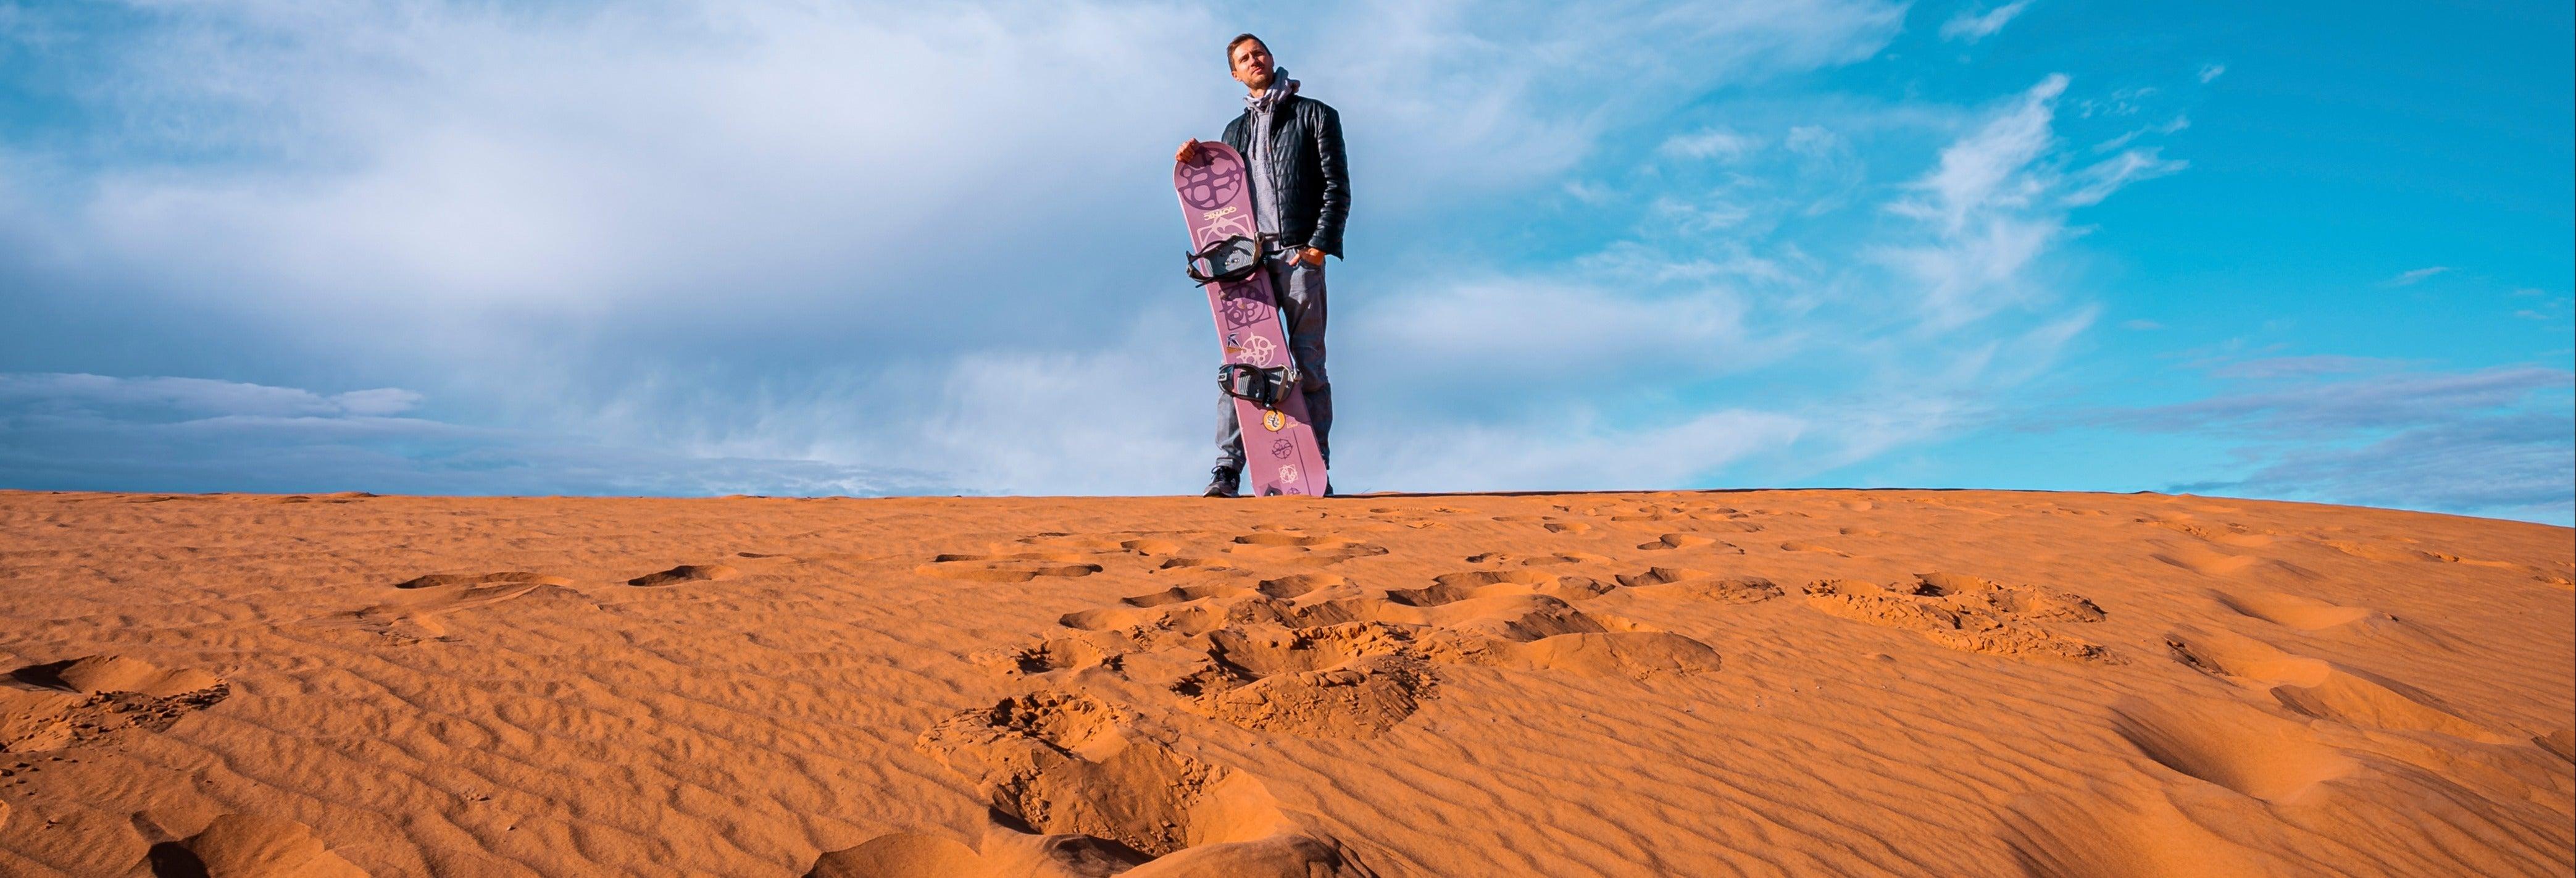 Sandboarding o sand skiing a Huacachina